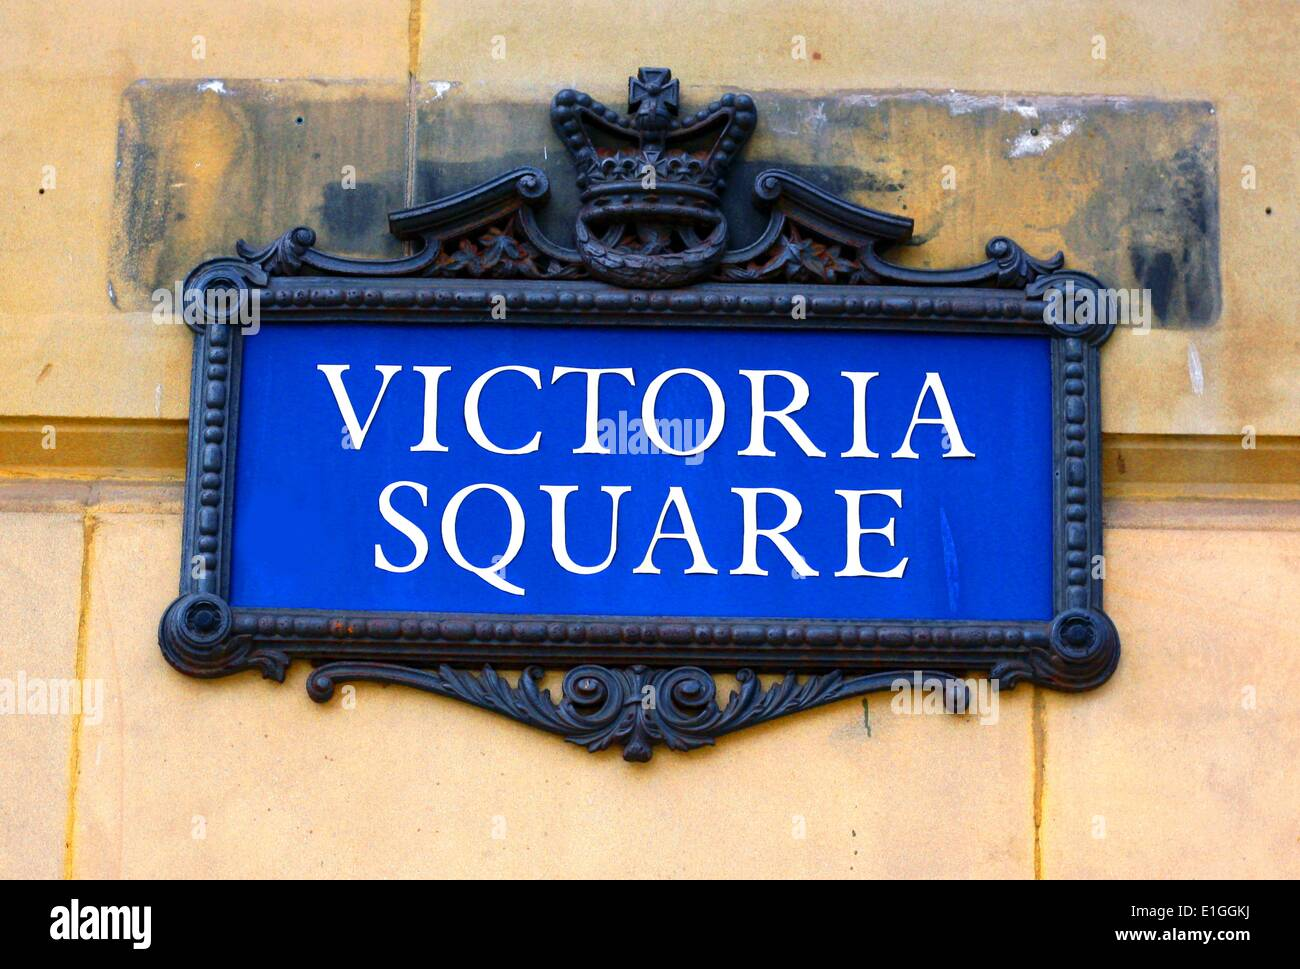 Signo de la calle Victoria Square, Birmingham, Inglaterra. Imagen De Stock